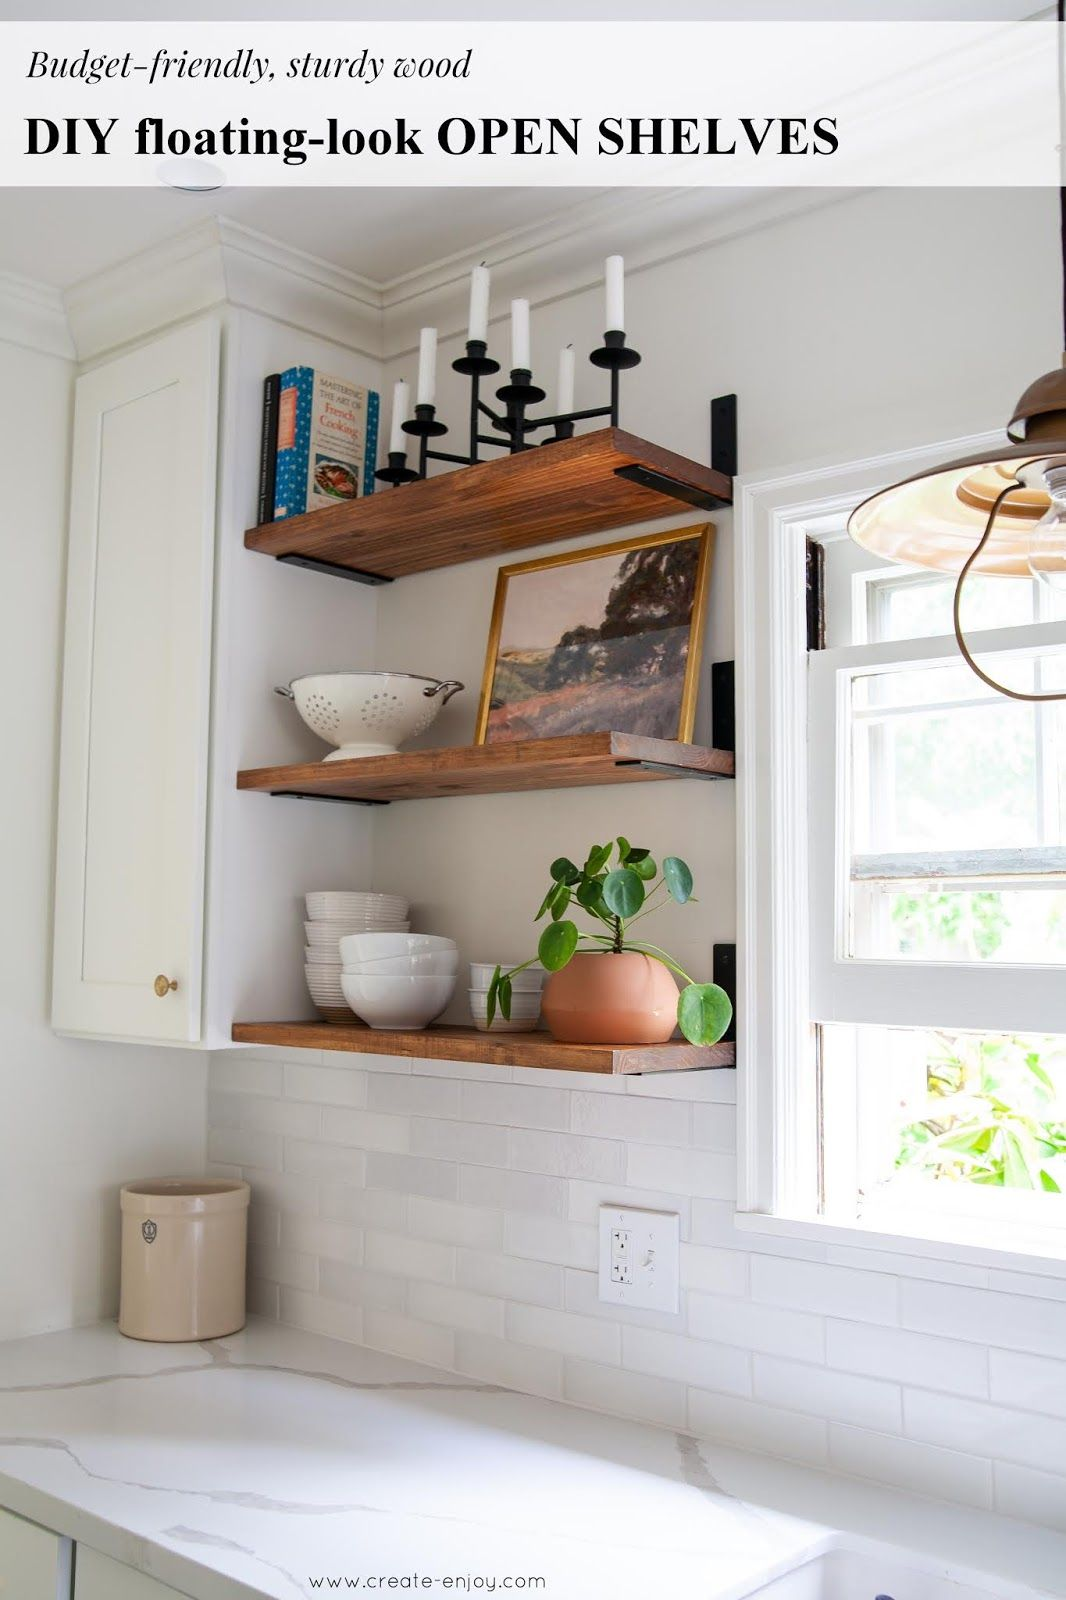 DIY, budgetfriendly floatinglook open shelves! in 2020